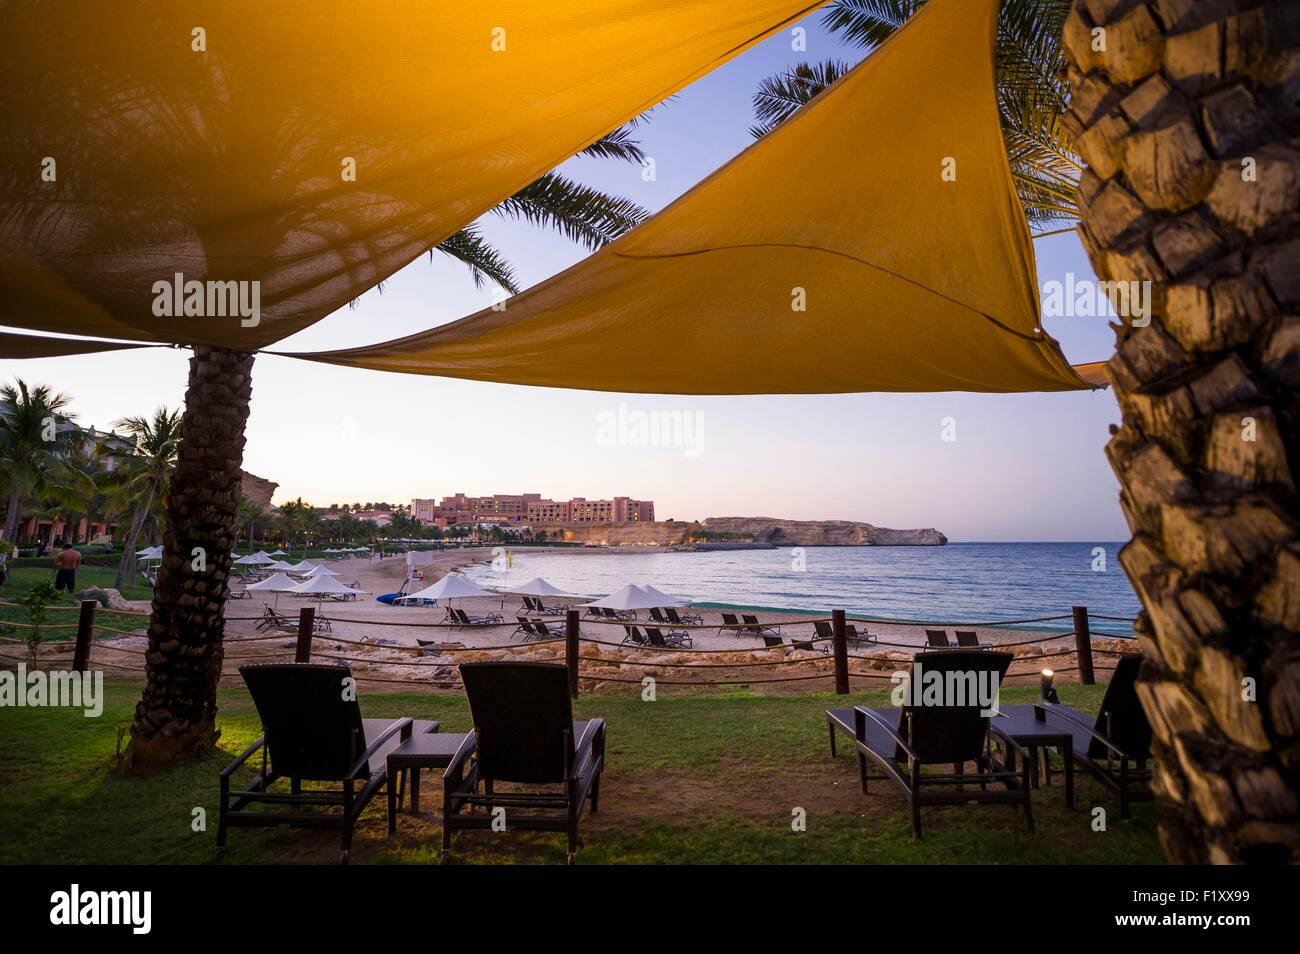 Oman, Moscato, Barr Al Jissah Resort, Shangri La Hotel, spiaggia Immagini Stock